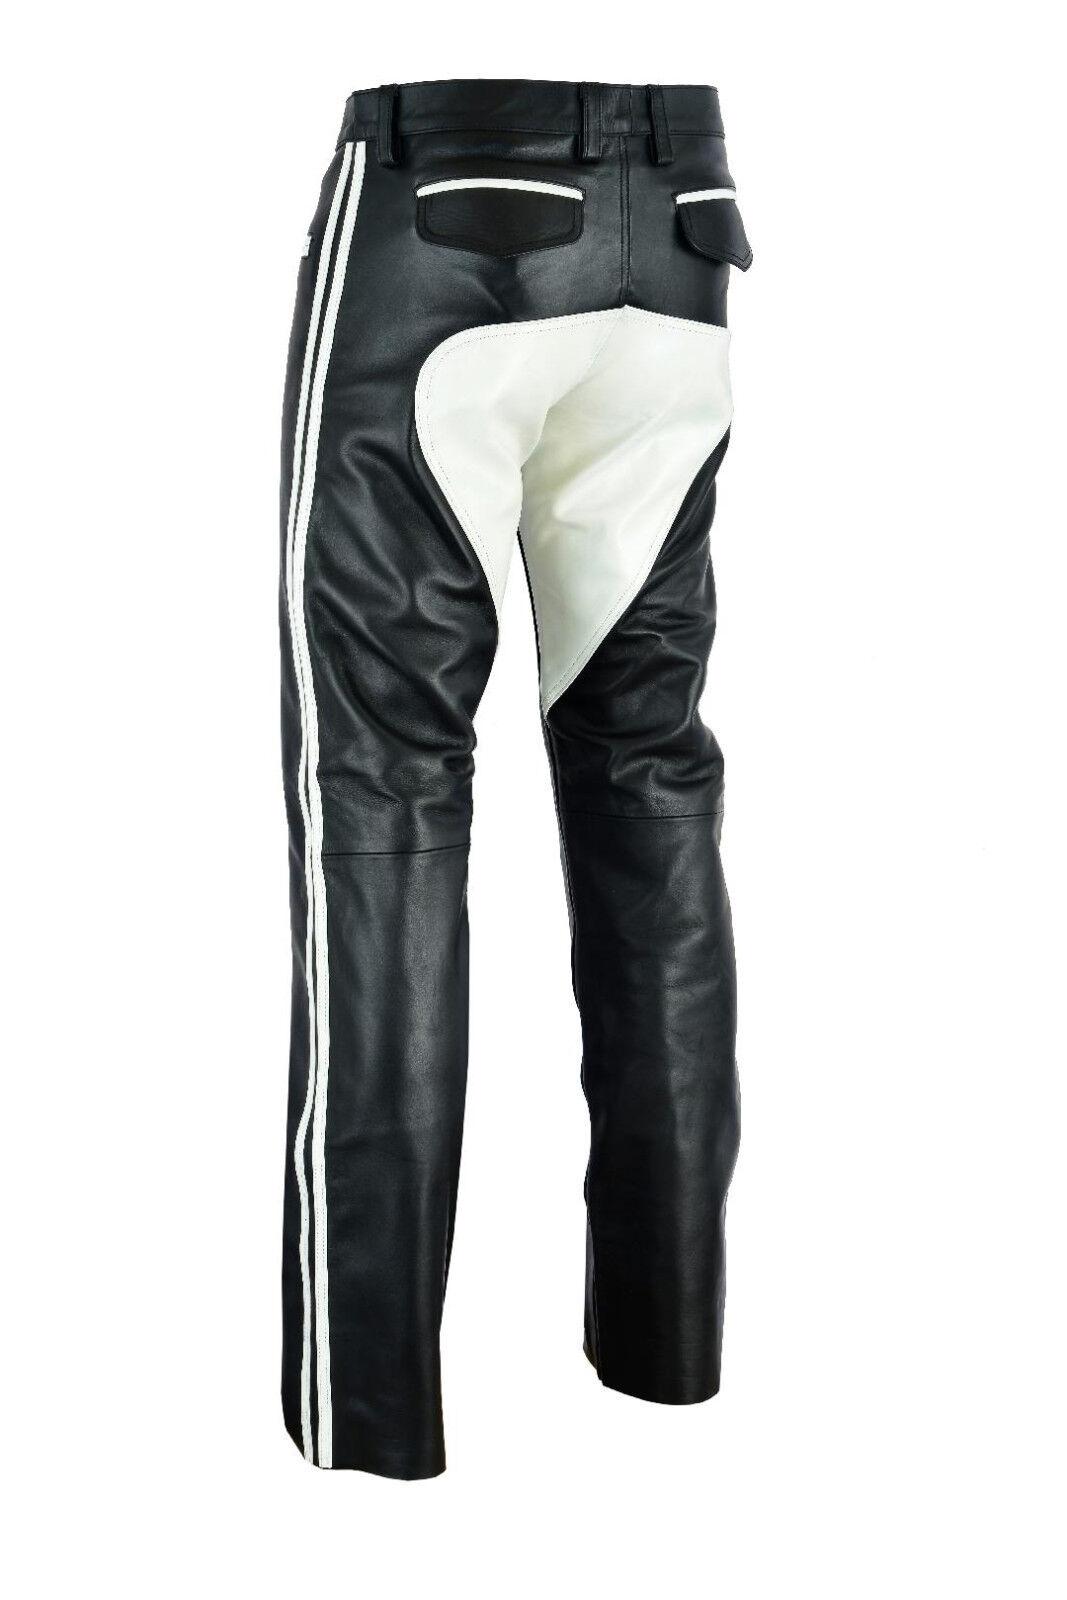 722 Leder hose mit Weissen besatz Sattel,Reithose,Lederhose,pantalon Gr.30W